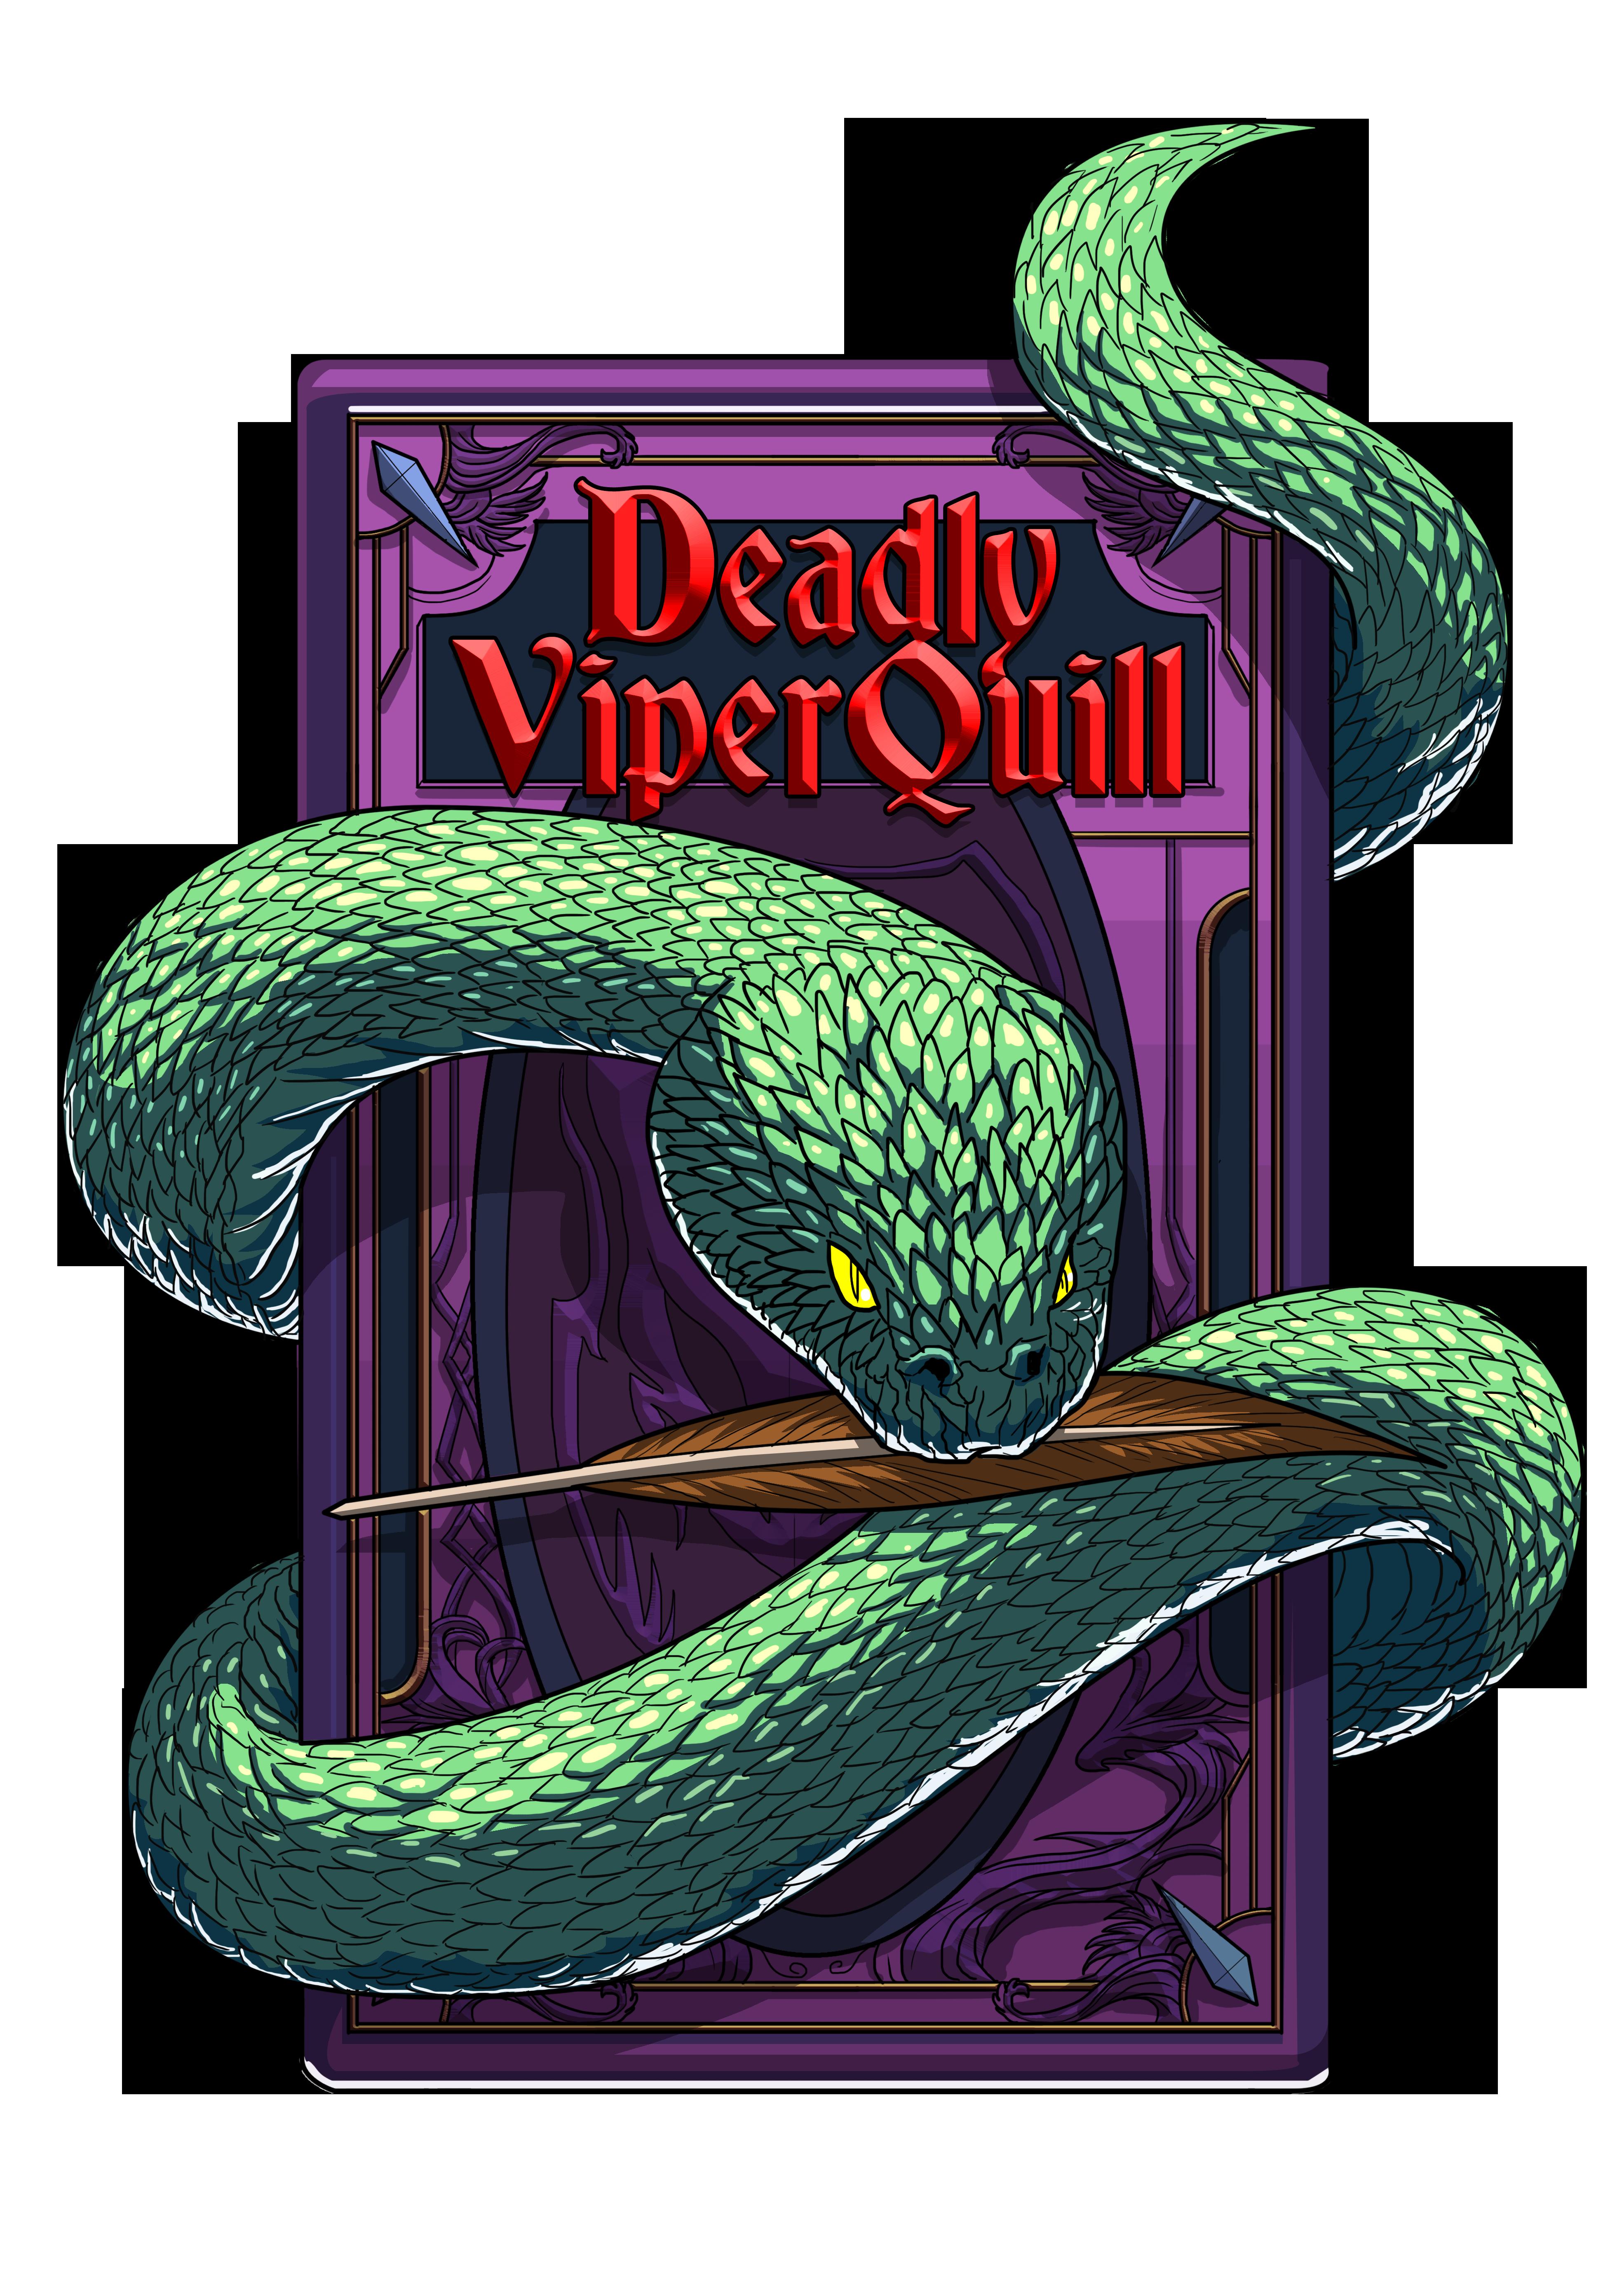 DeadlyViperQuill Logo